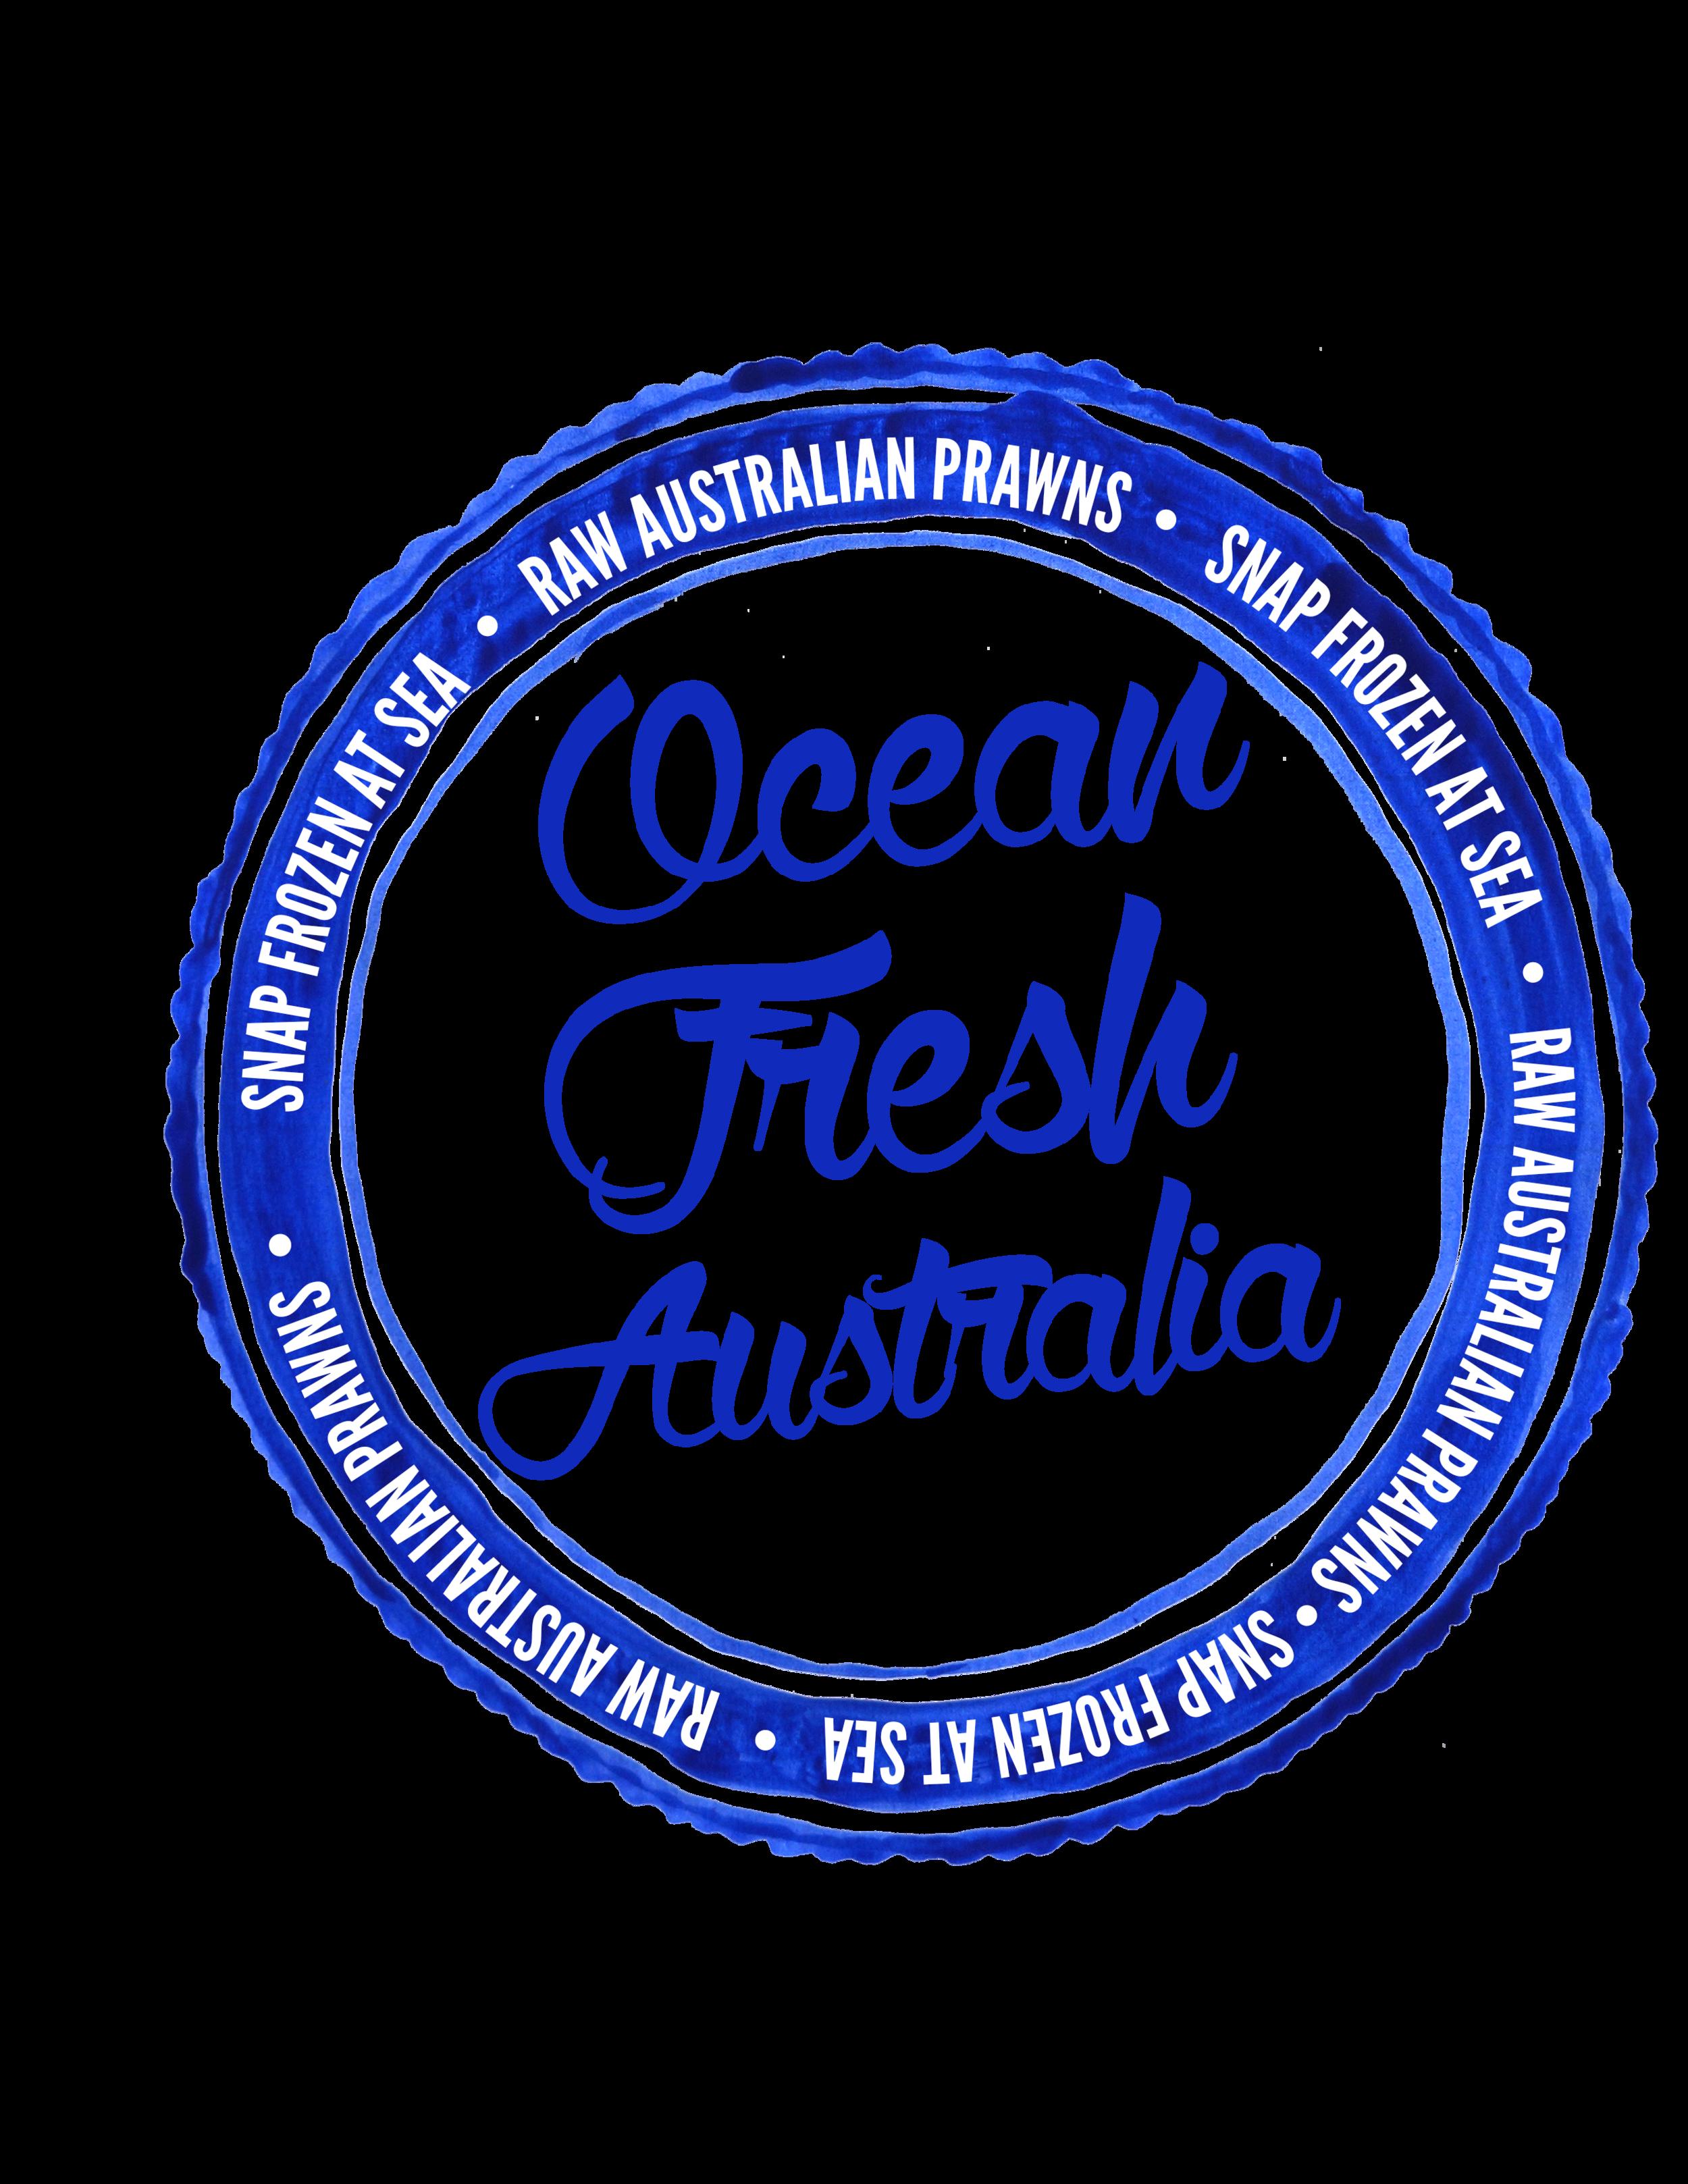 oceean fresh australia logo .png